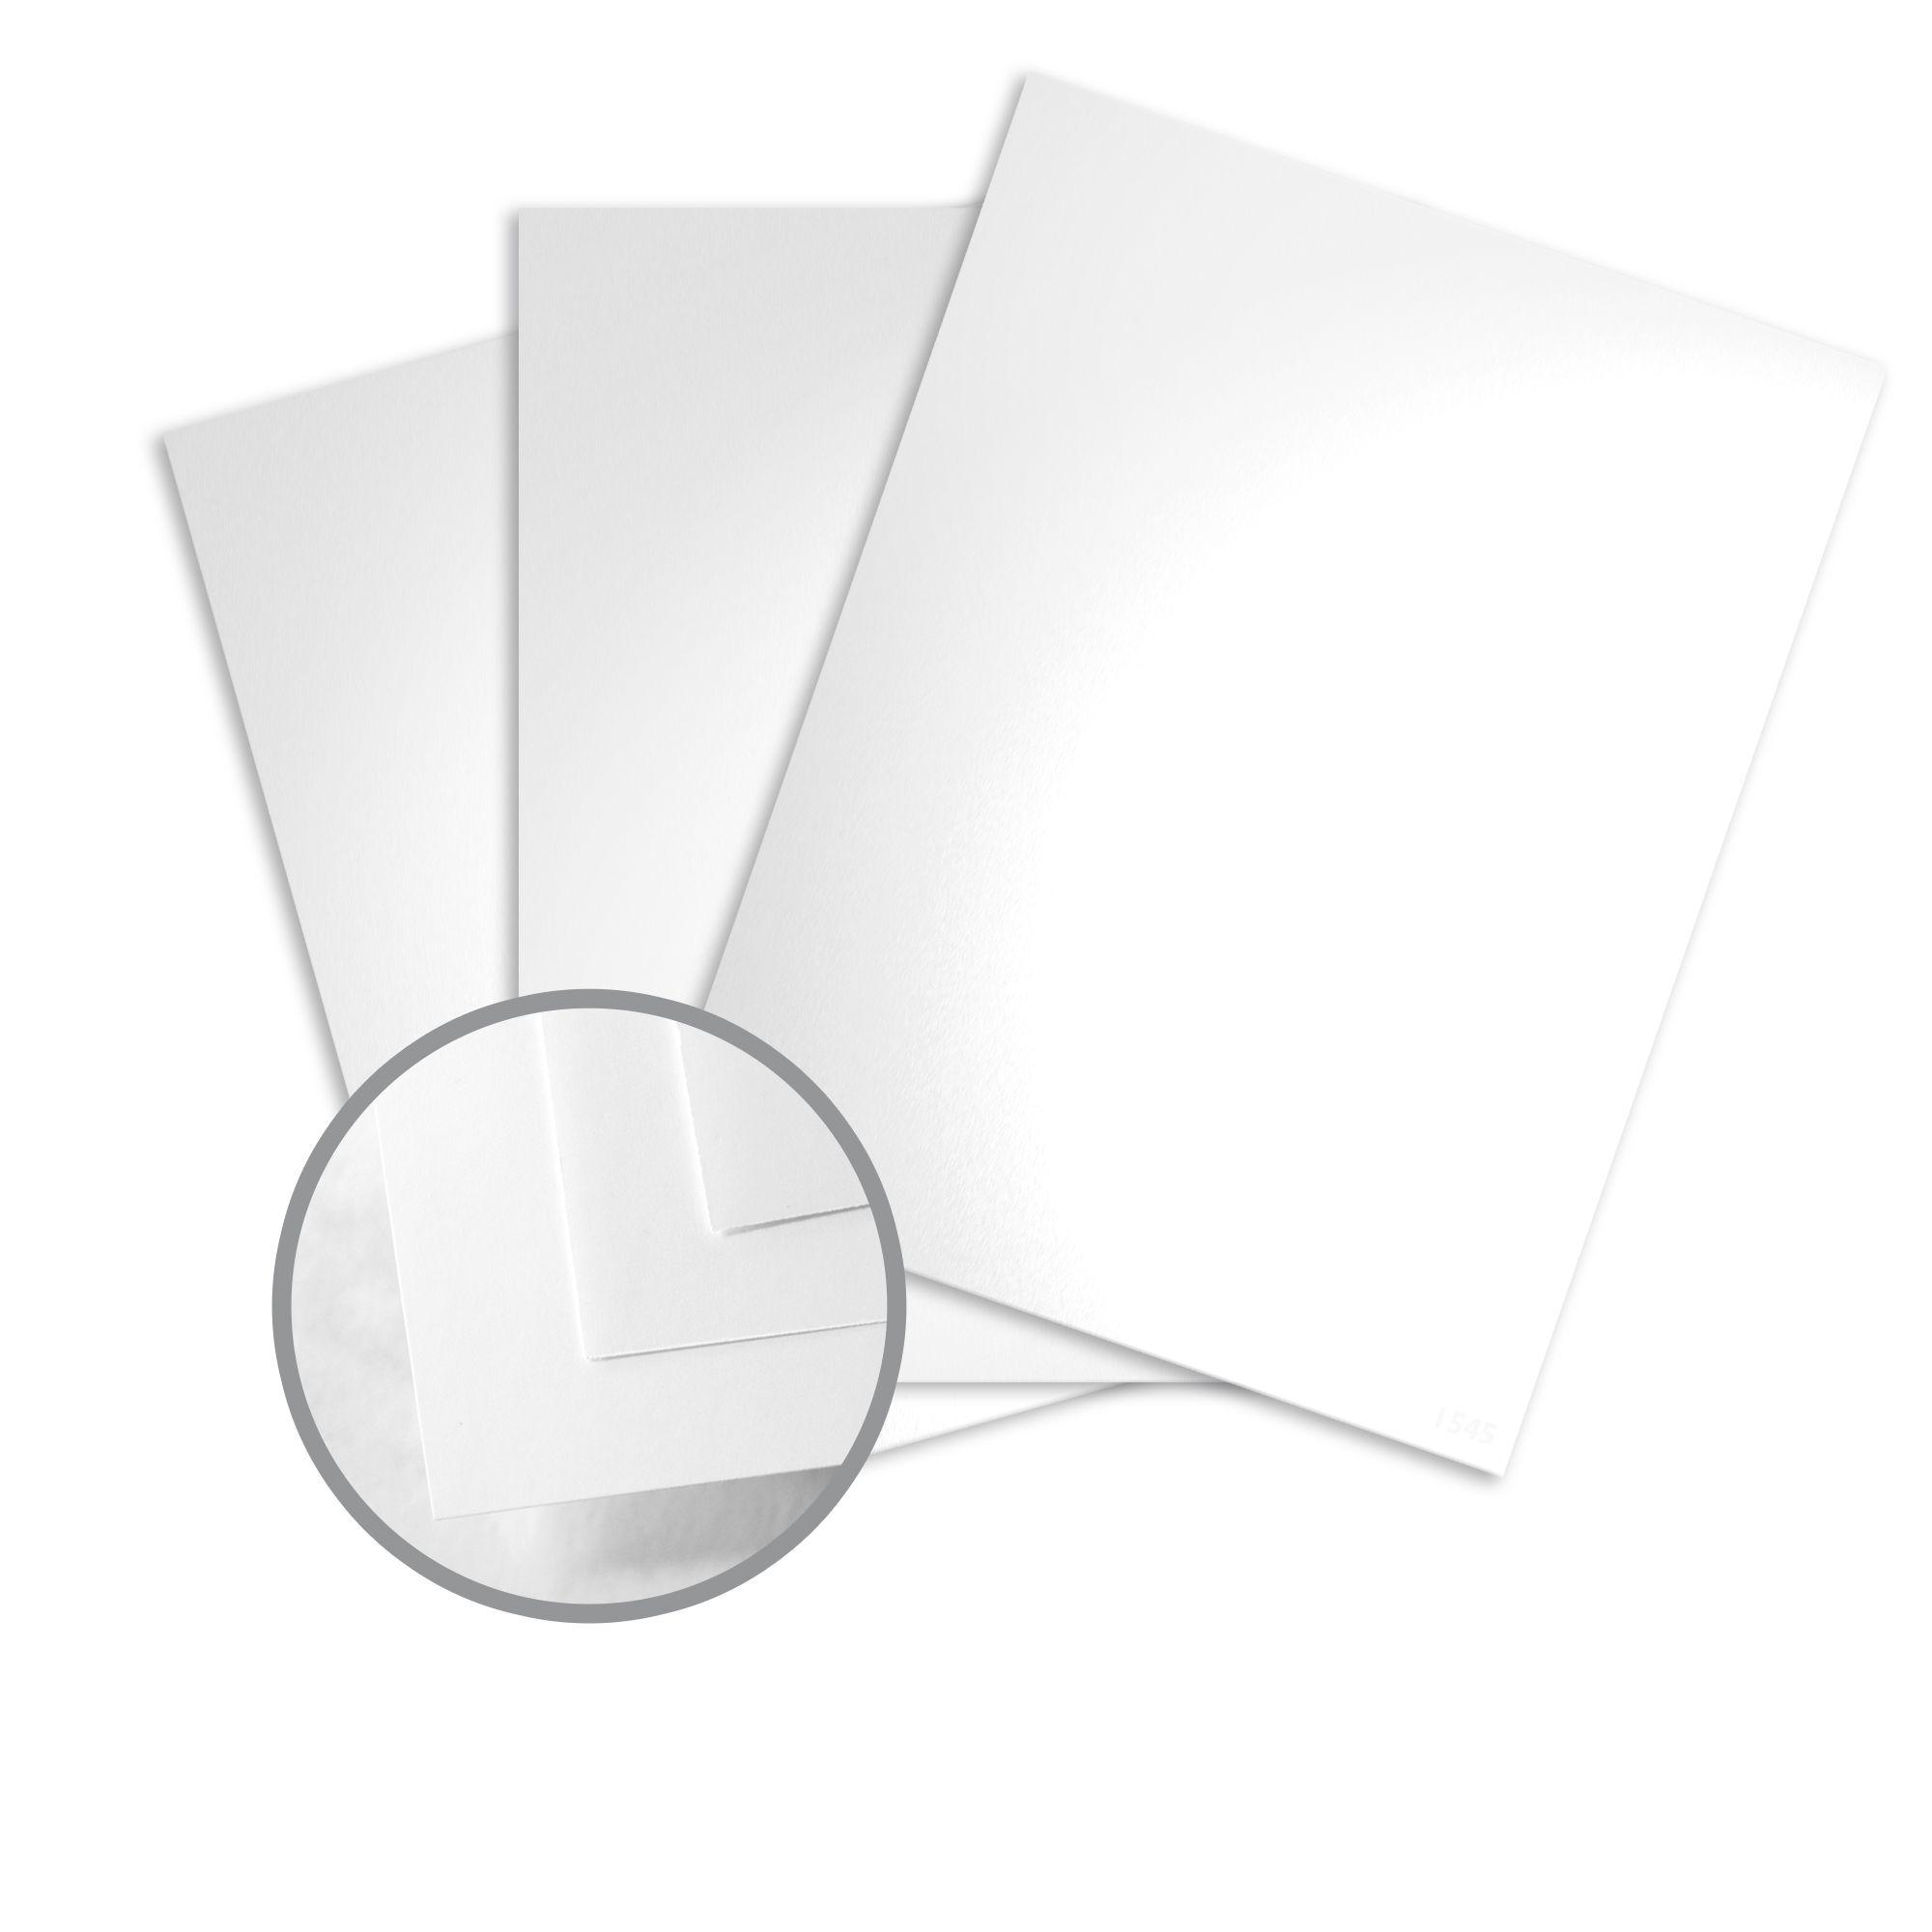 250 Brochures 80lb Heavyweight White Brochure Paper